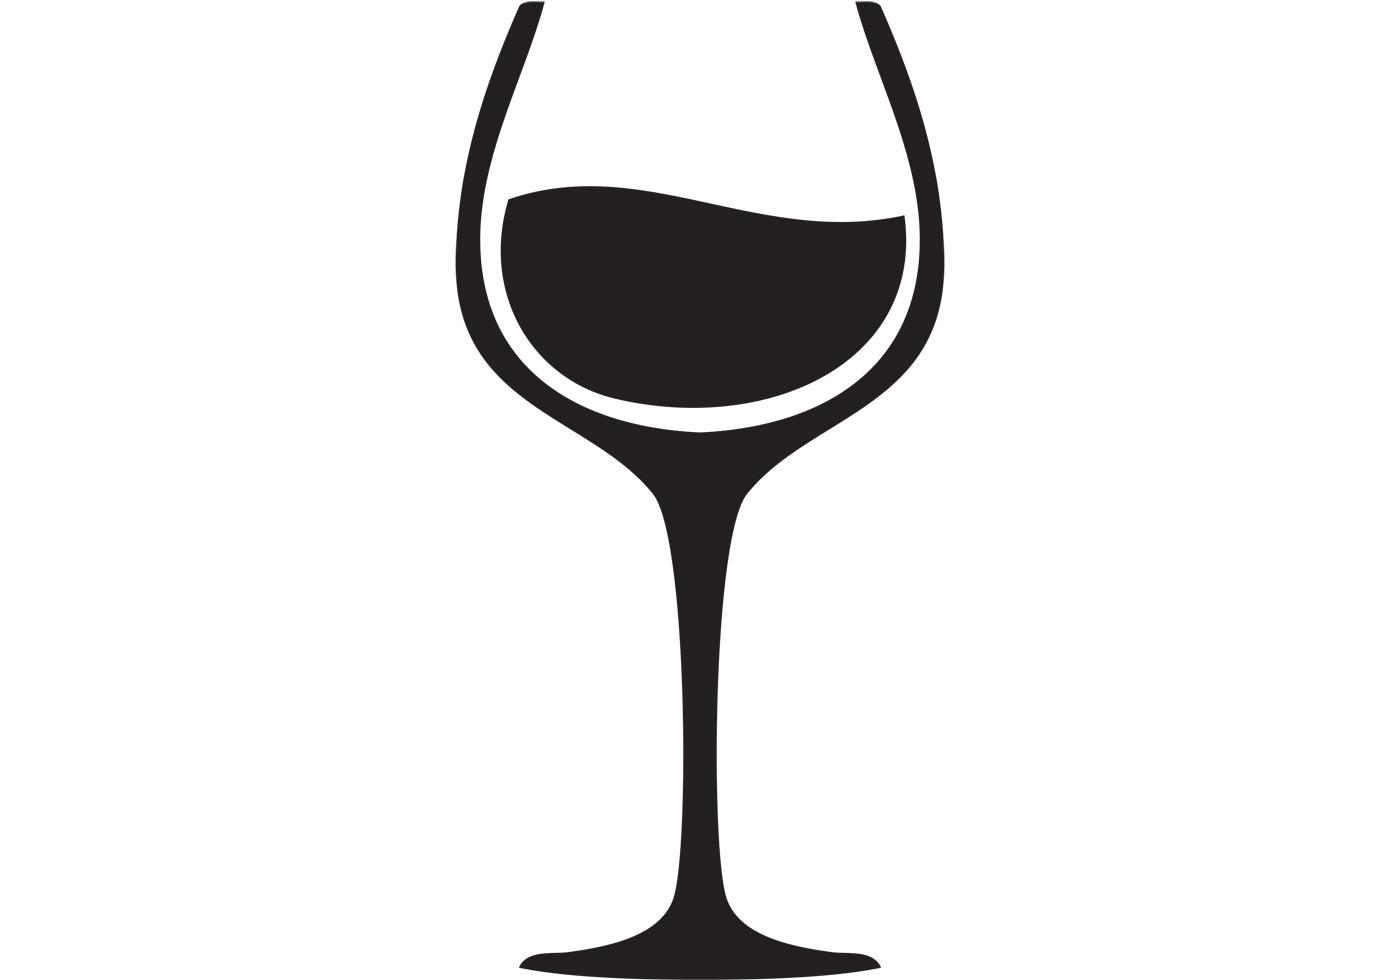 Black clipart wine glass #8